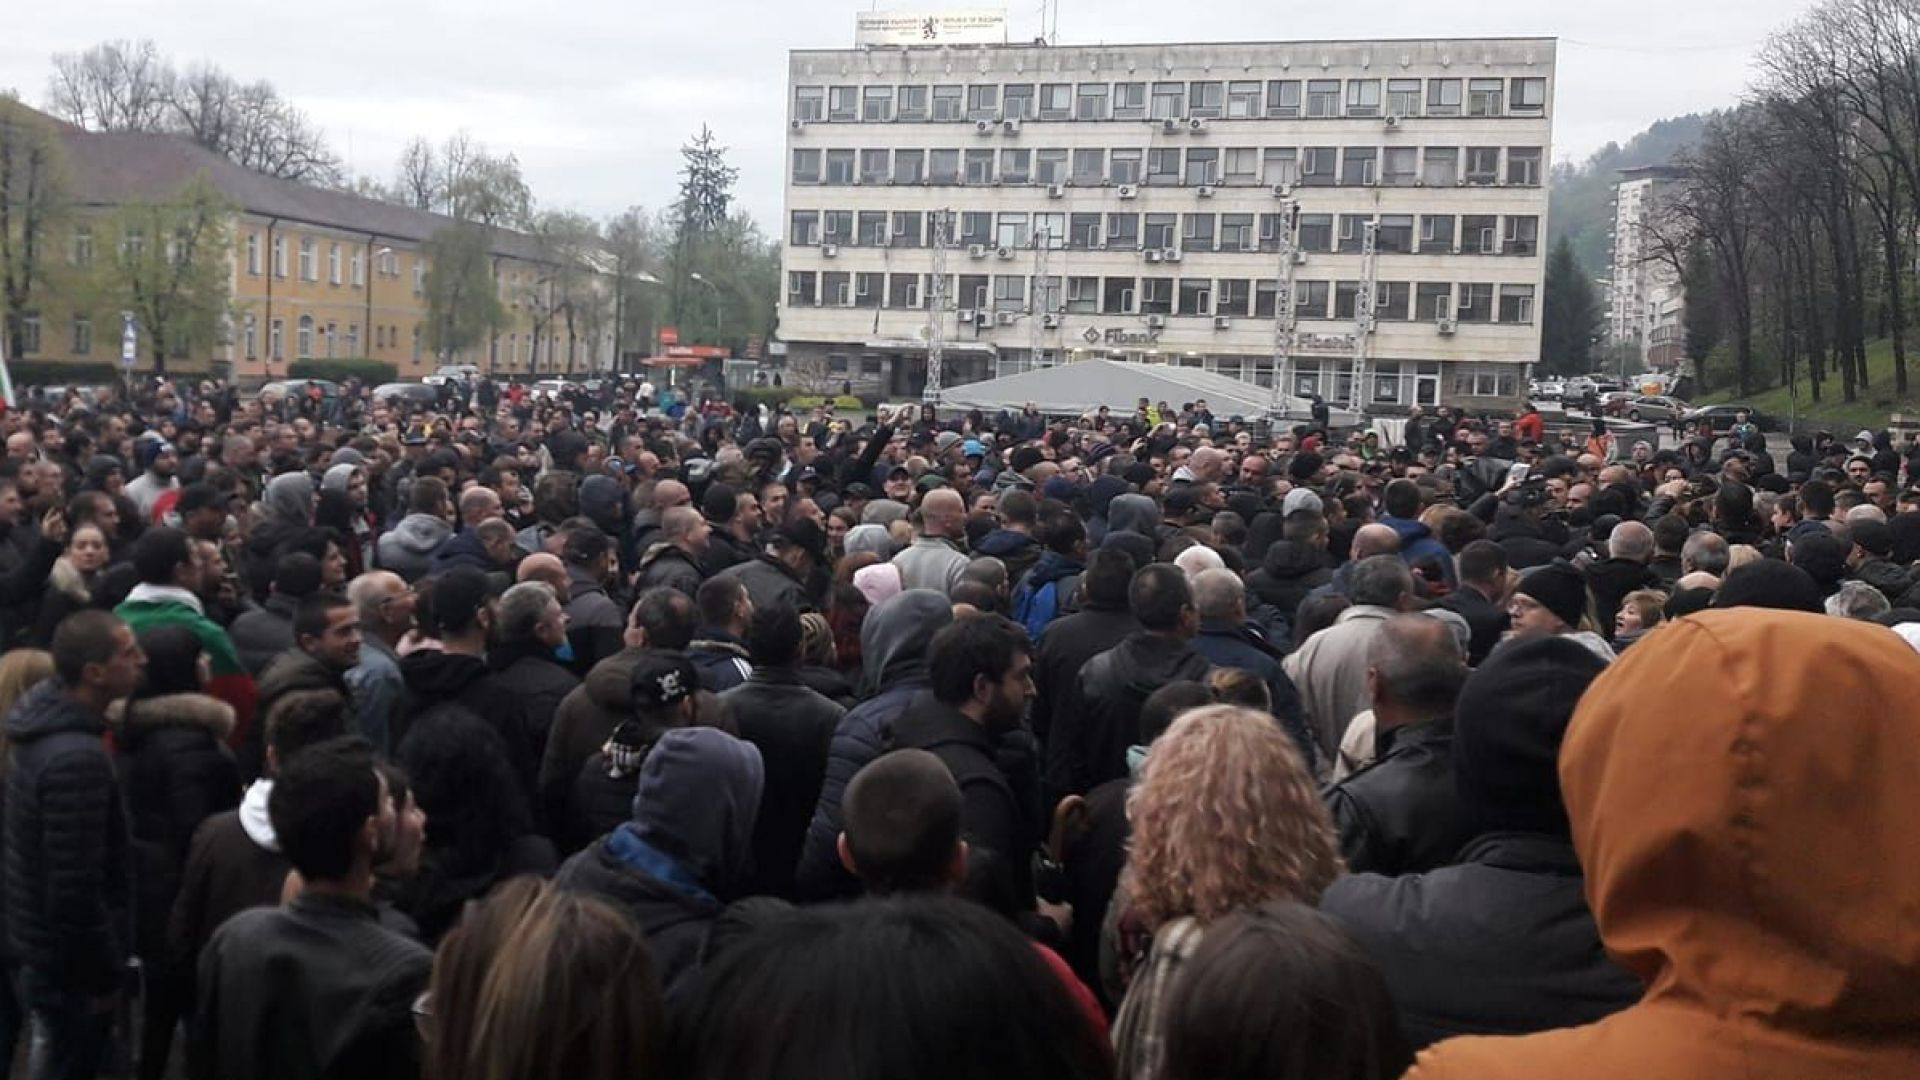 Нов протест в Габрово. Дончев призова: Не се бийте!